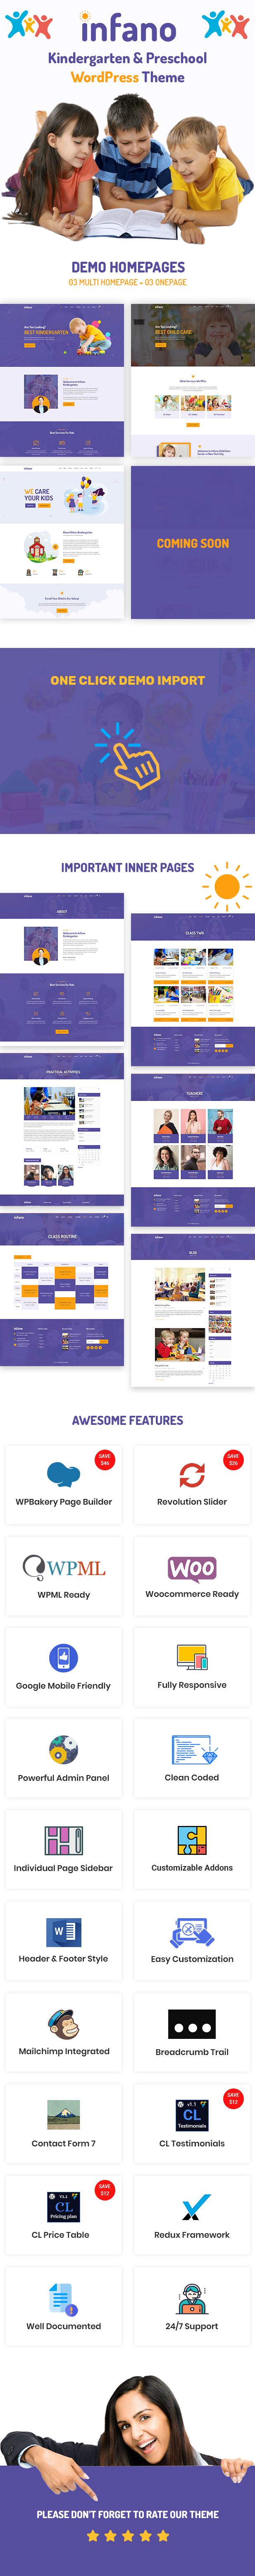 Infano - Kindergarten & Preschool WordPress Theme - 3